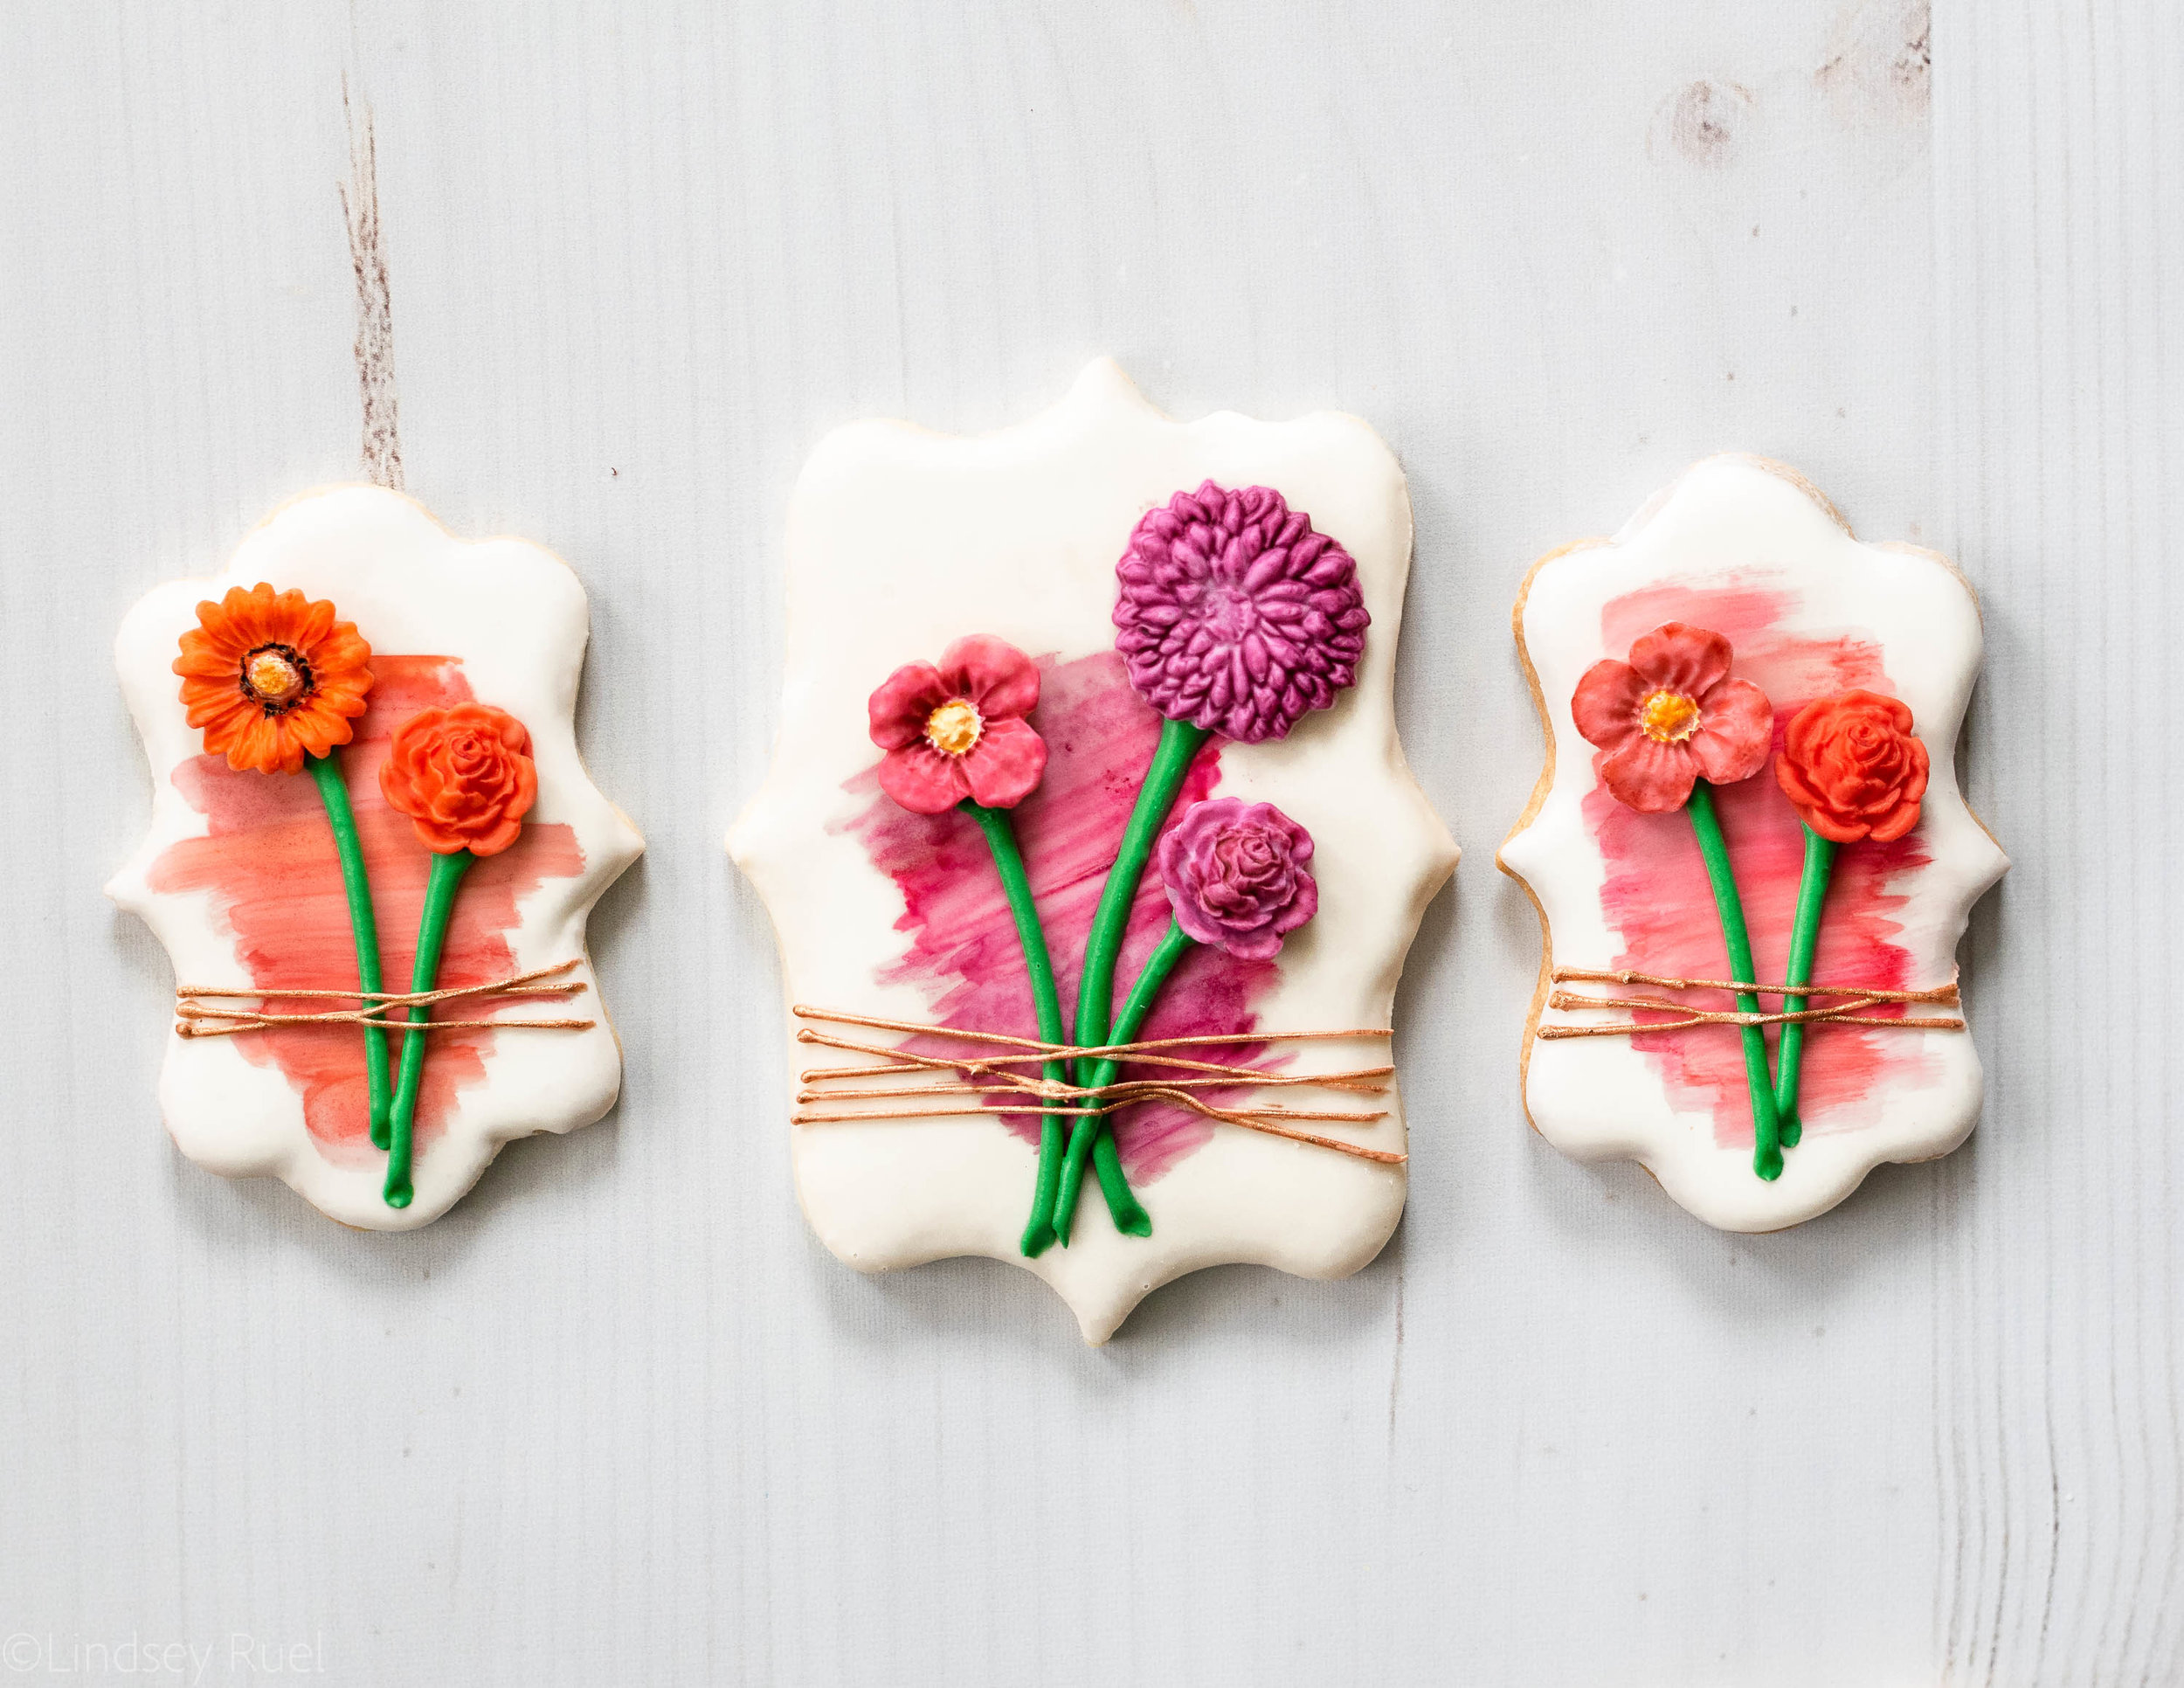 Fondant-Flower-Stem-Cookies-9.jpg